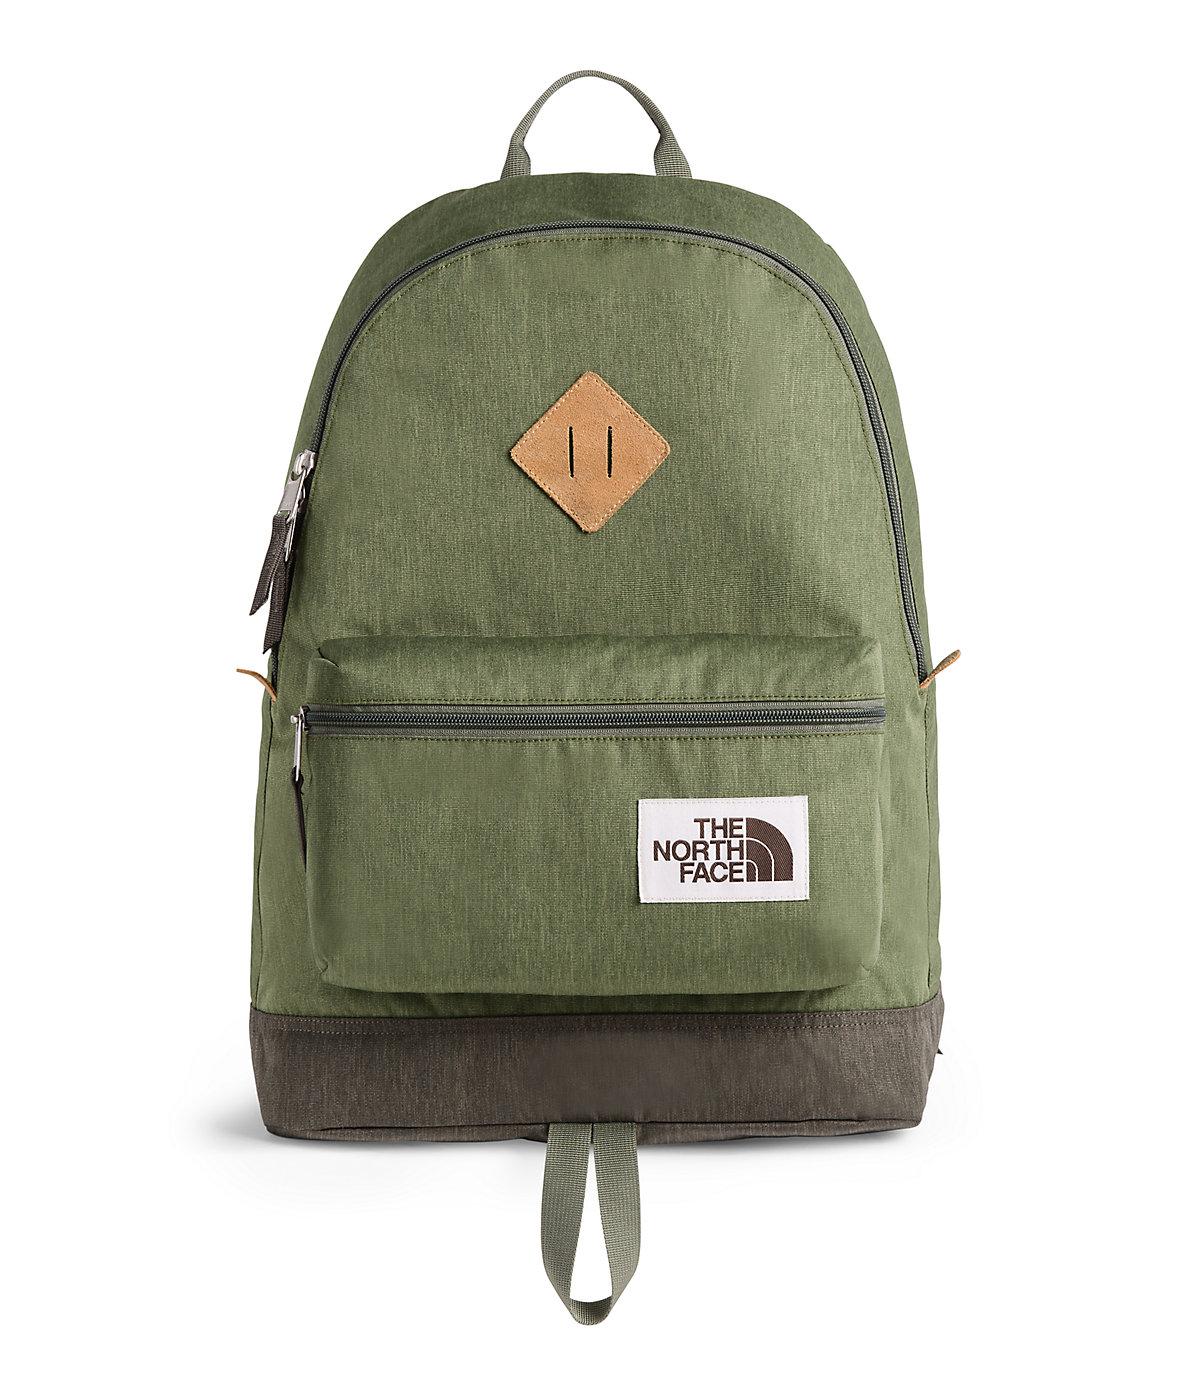 c661e35b6 Berkeley backpack in 2019 | Products | Backpacks, School backpacks ...